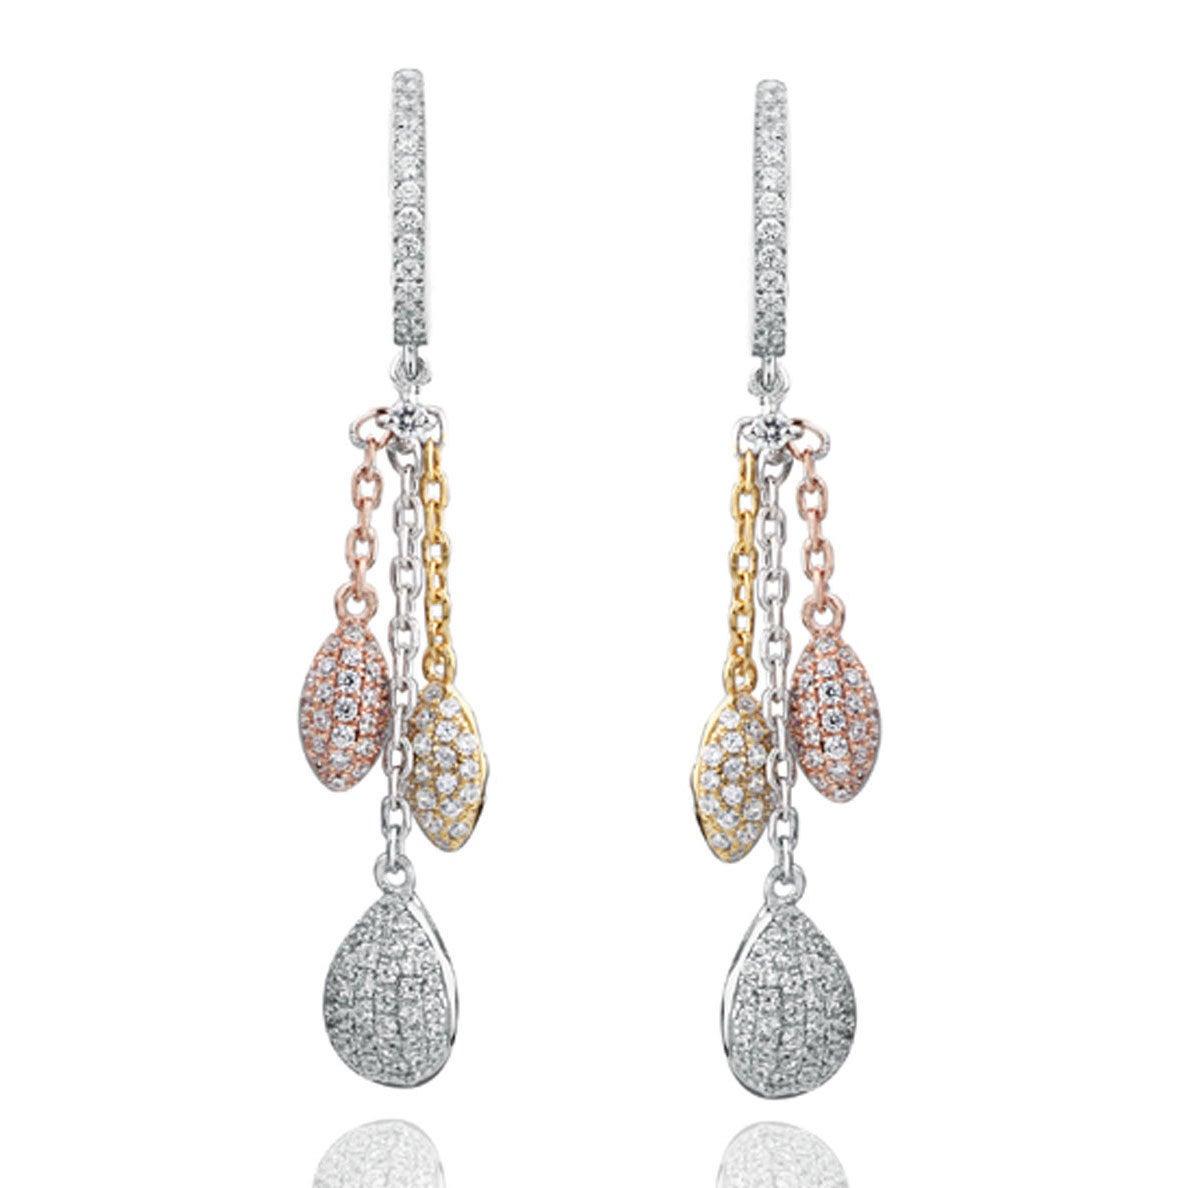 Suzy L Tri Tone Sterling Silver White Cubic Zirconia Dangle Earrings